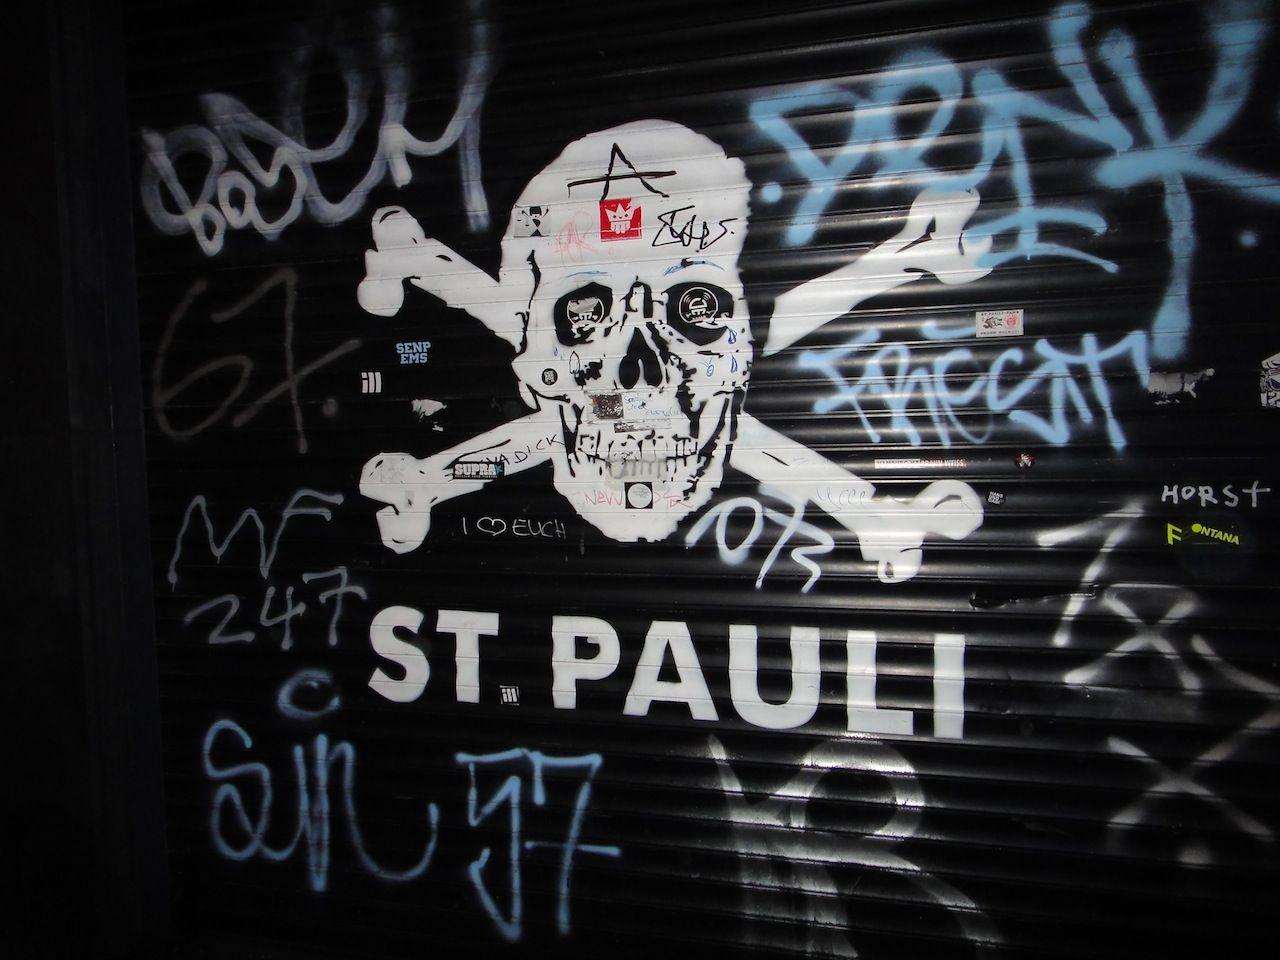 St Pauli Perle